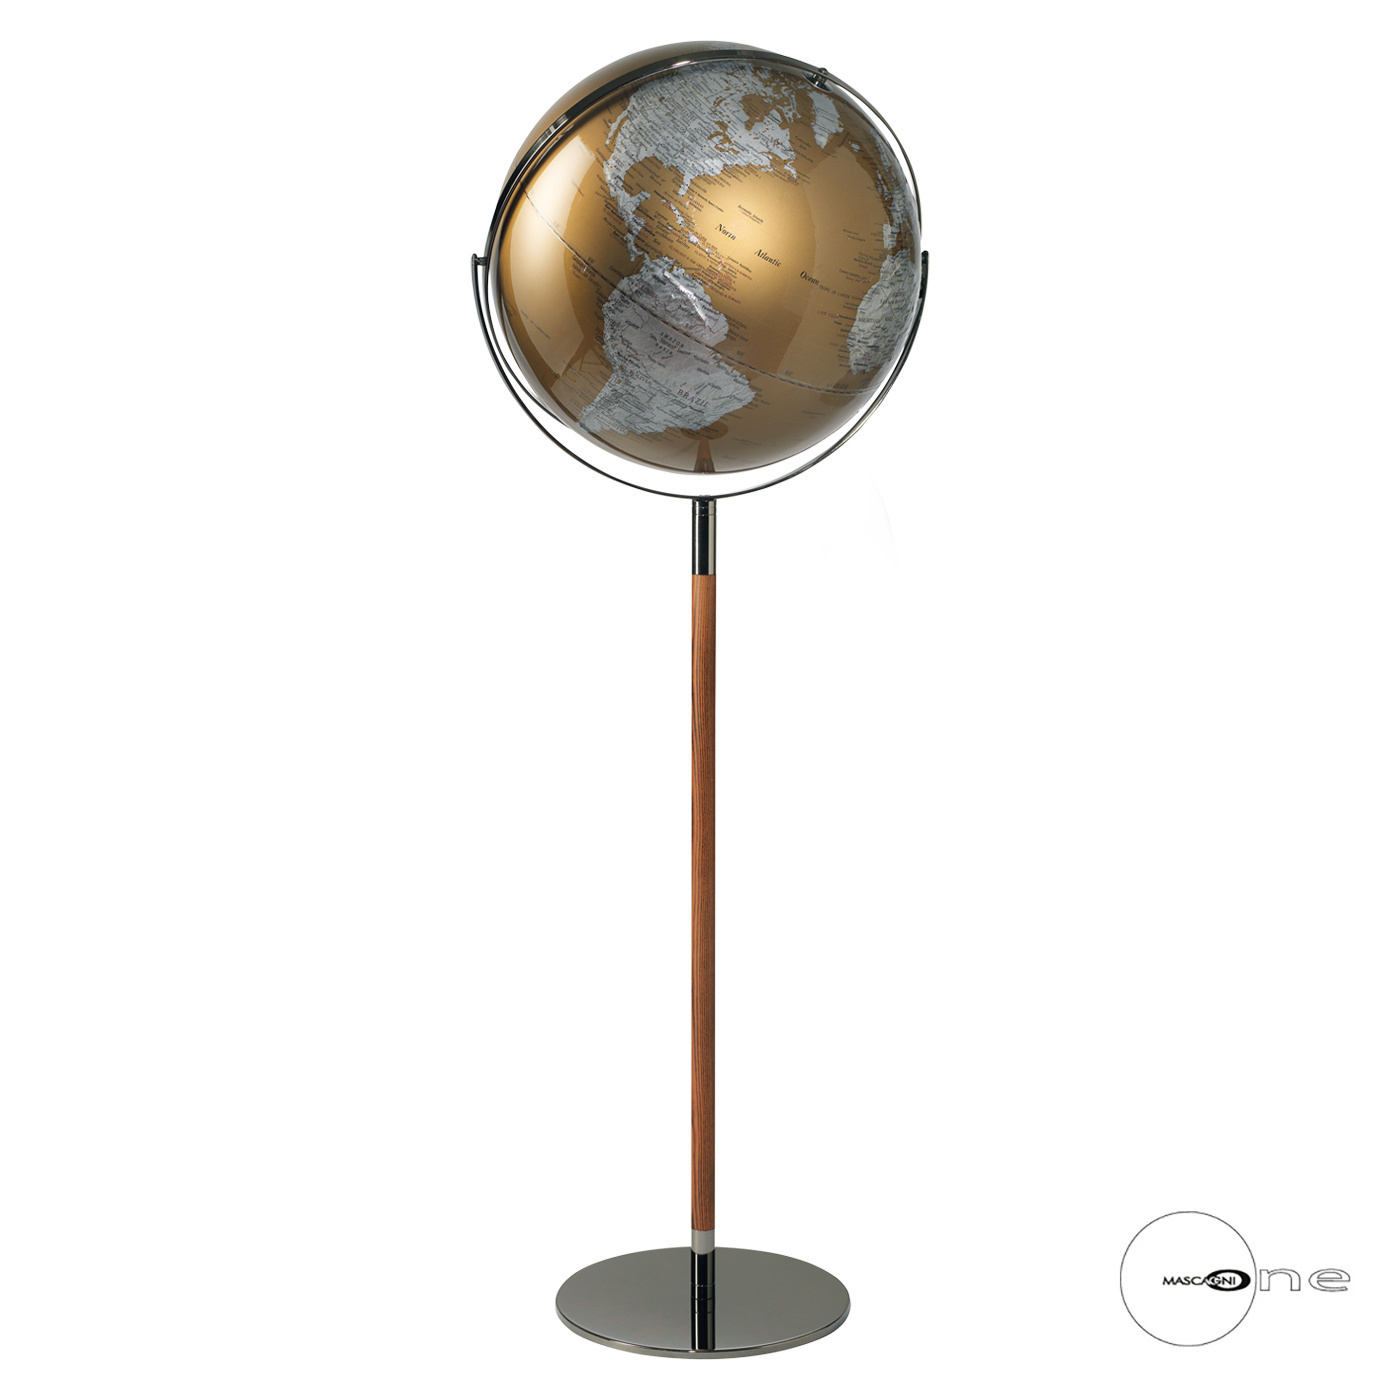 Art Mascagni O1551 GLOBE DIAM.43 - COL.GOLD